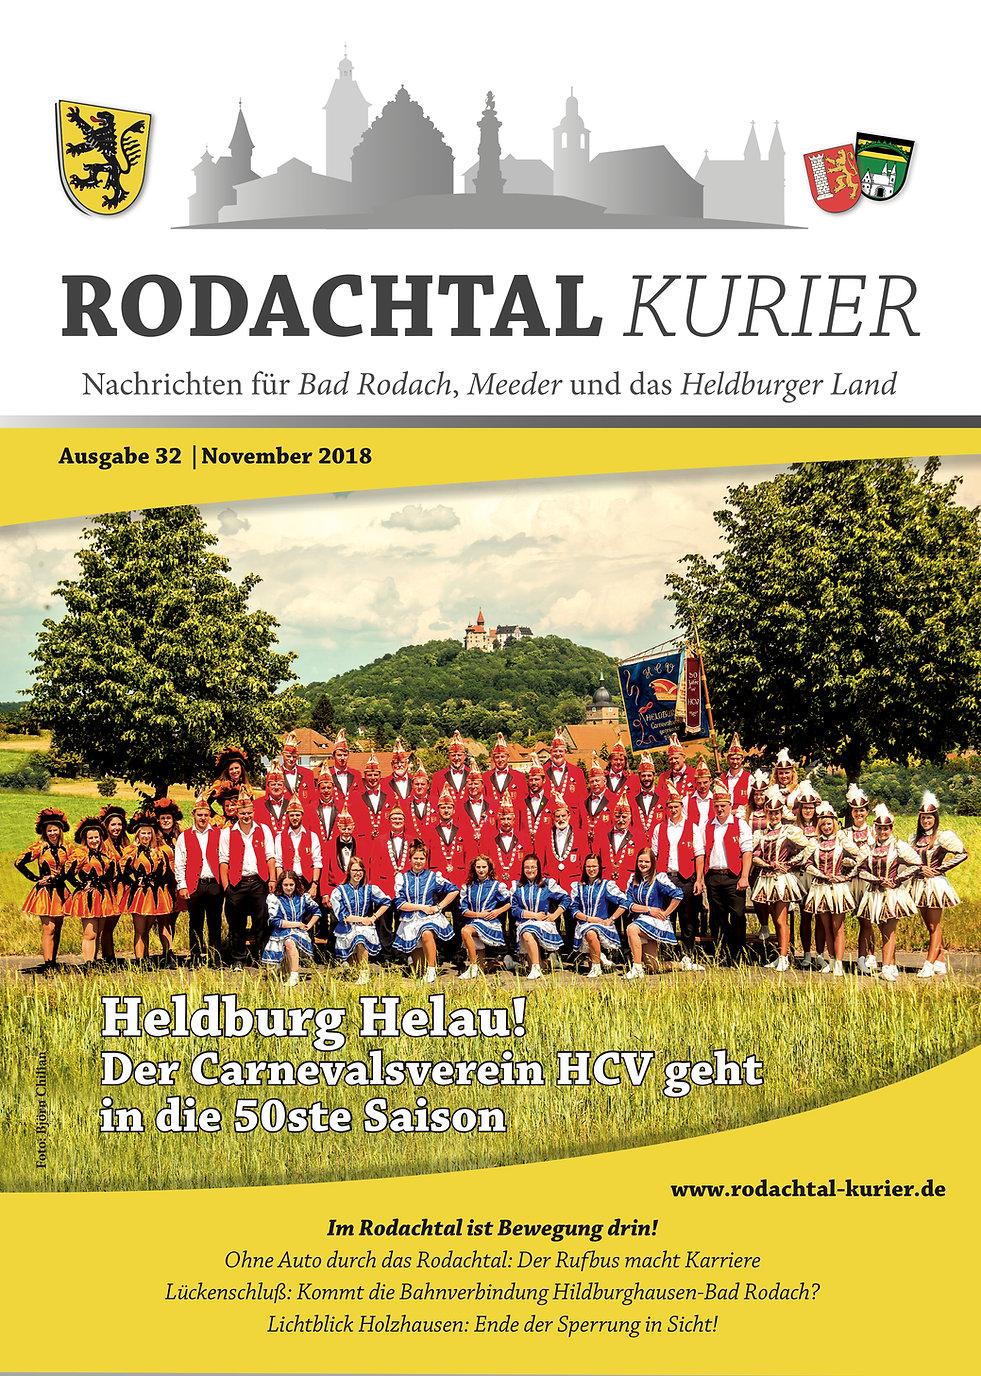 RTK_Cover_Nov18.jpg